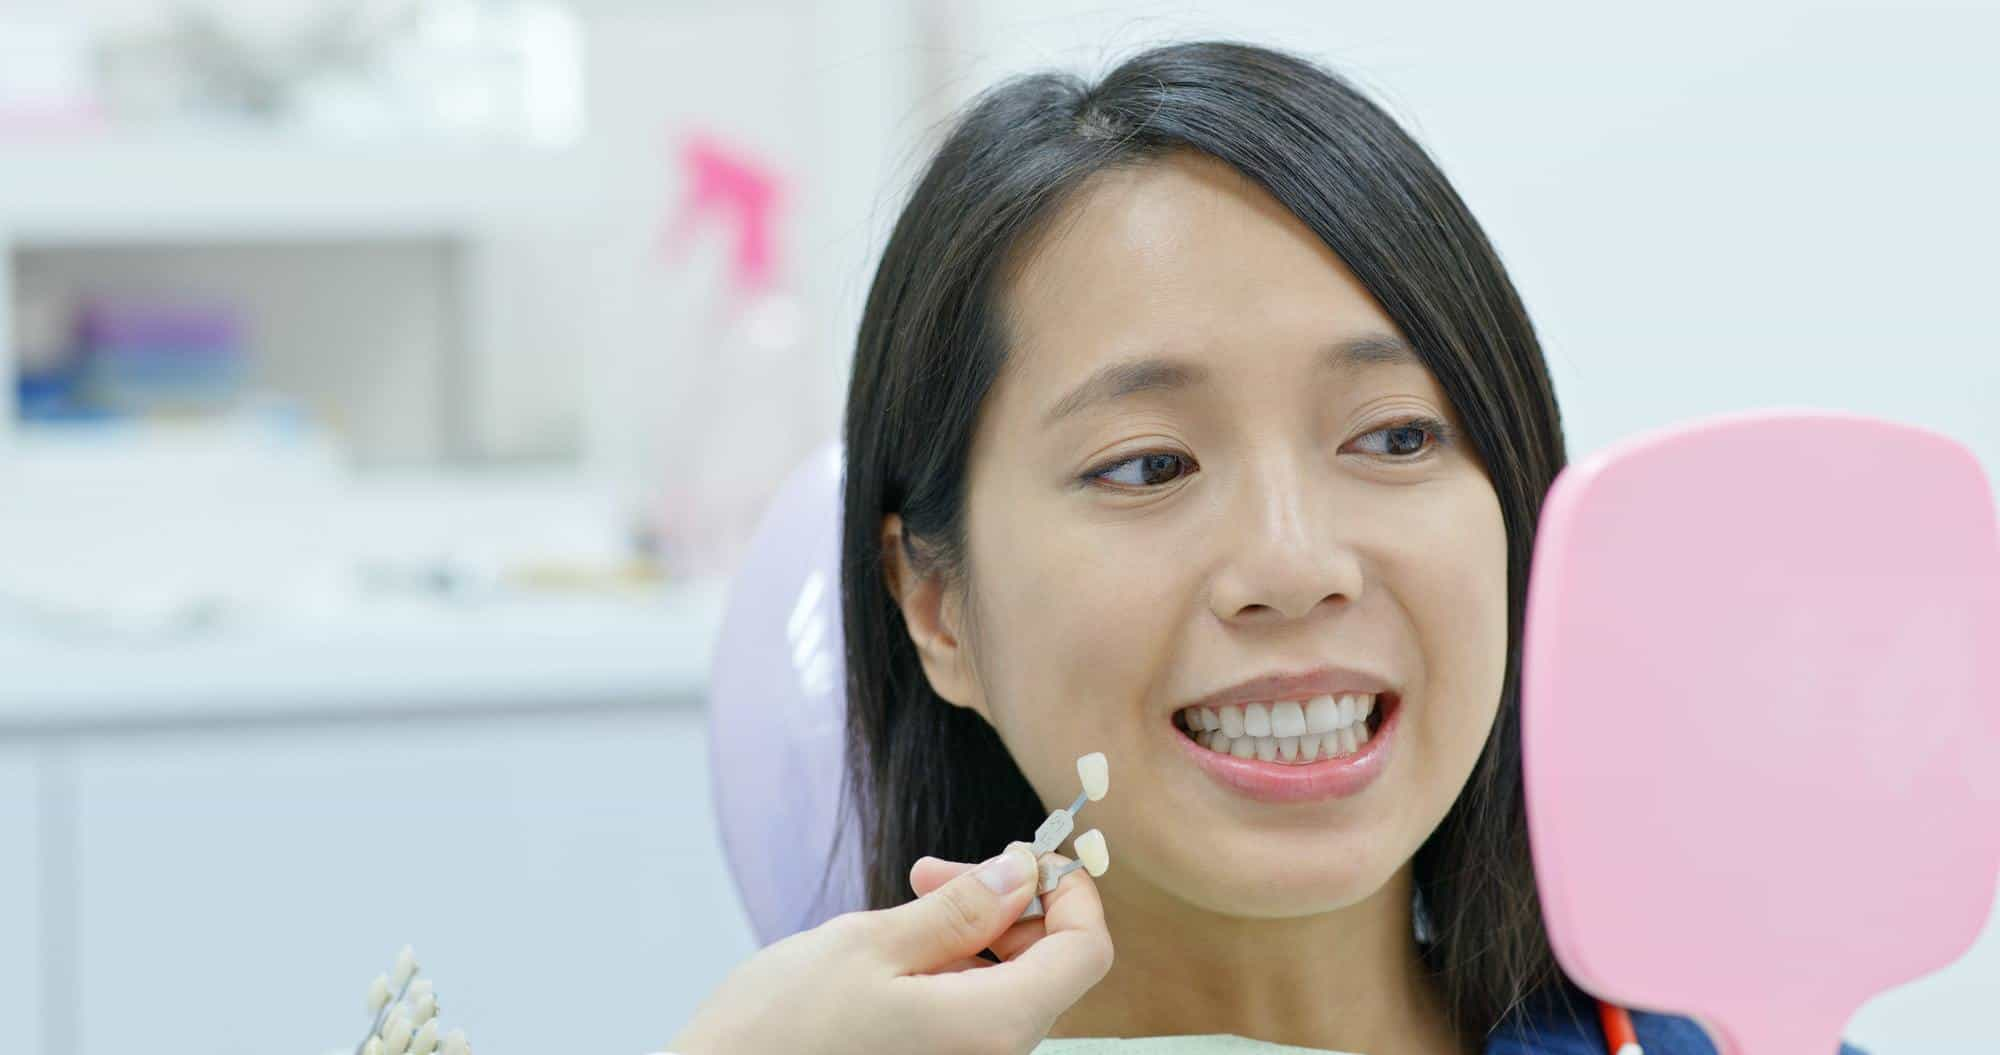 Woman go dental clinic for whitening teeth